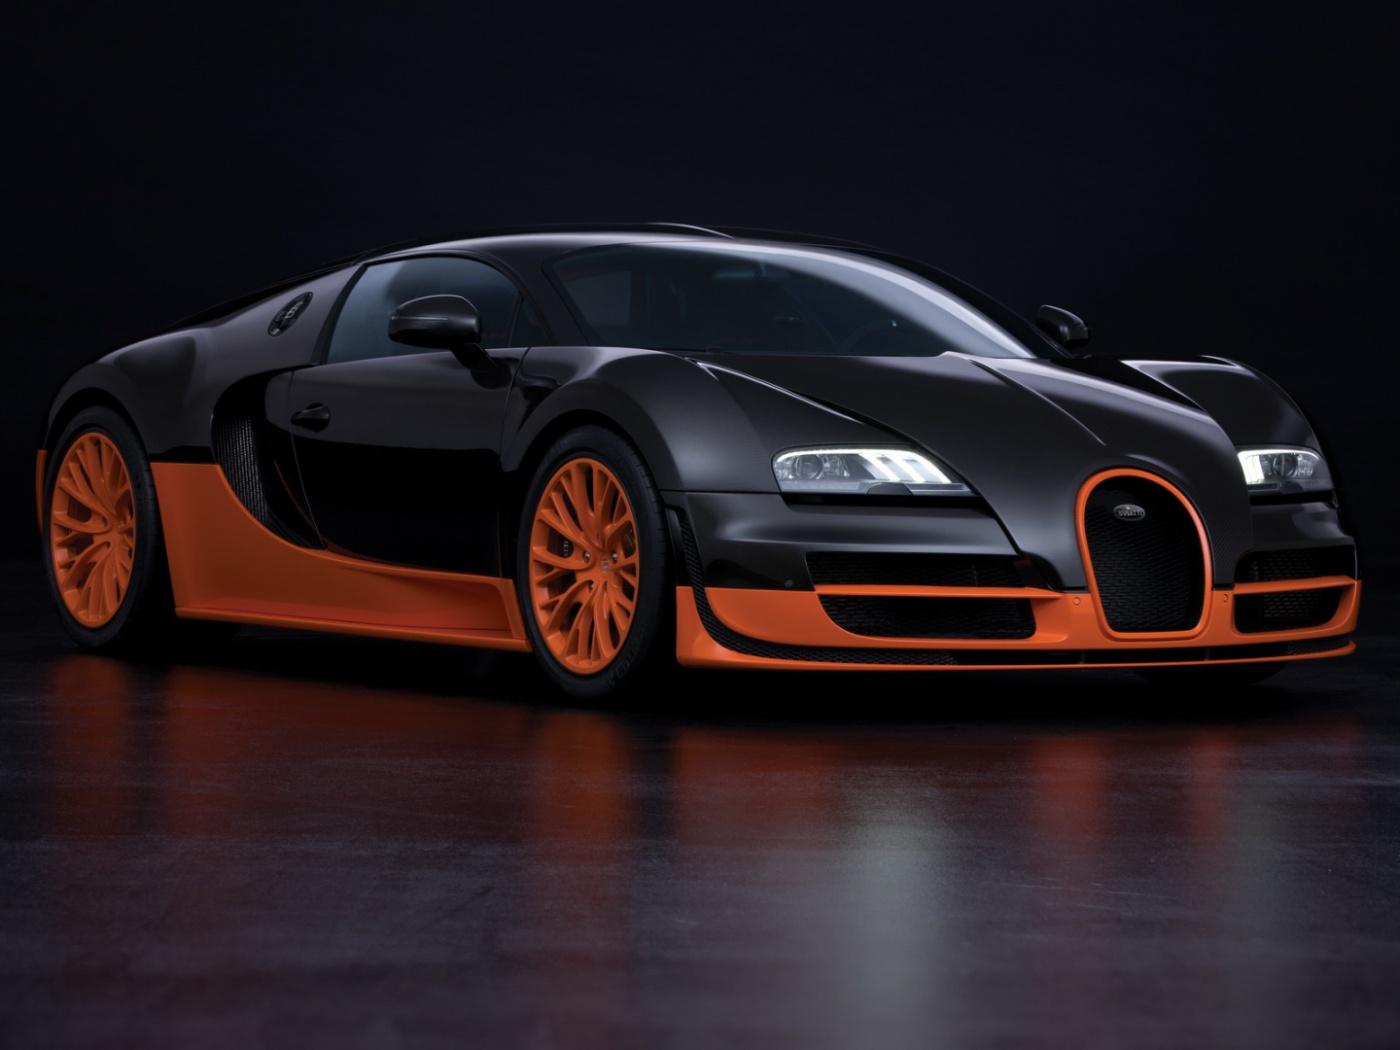 ماشین Bugatti Veyron 16.4 Super Sport